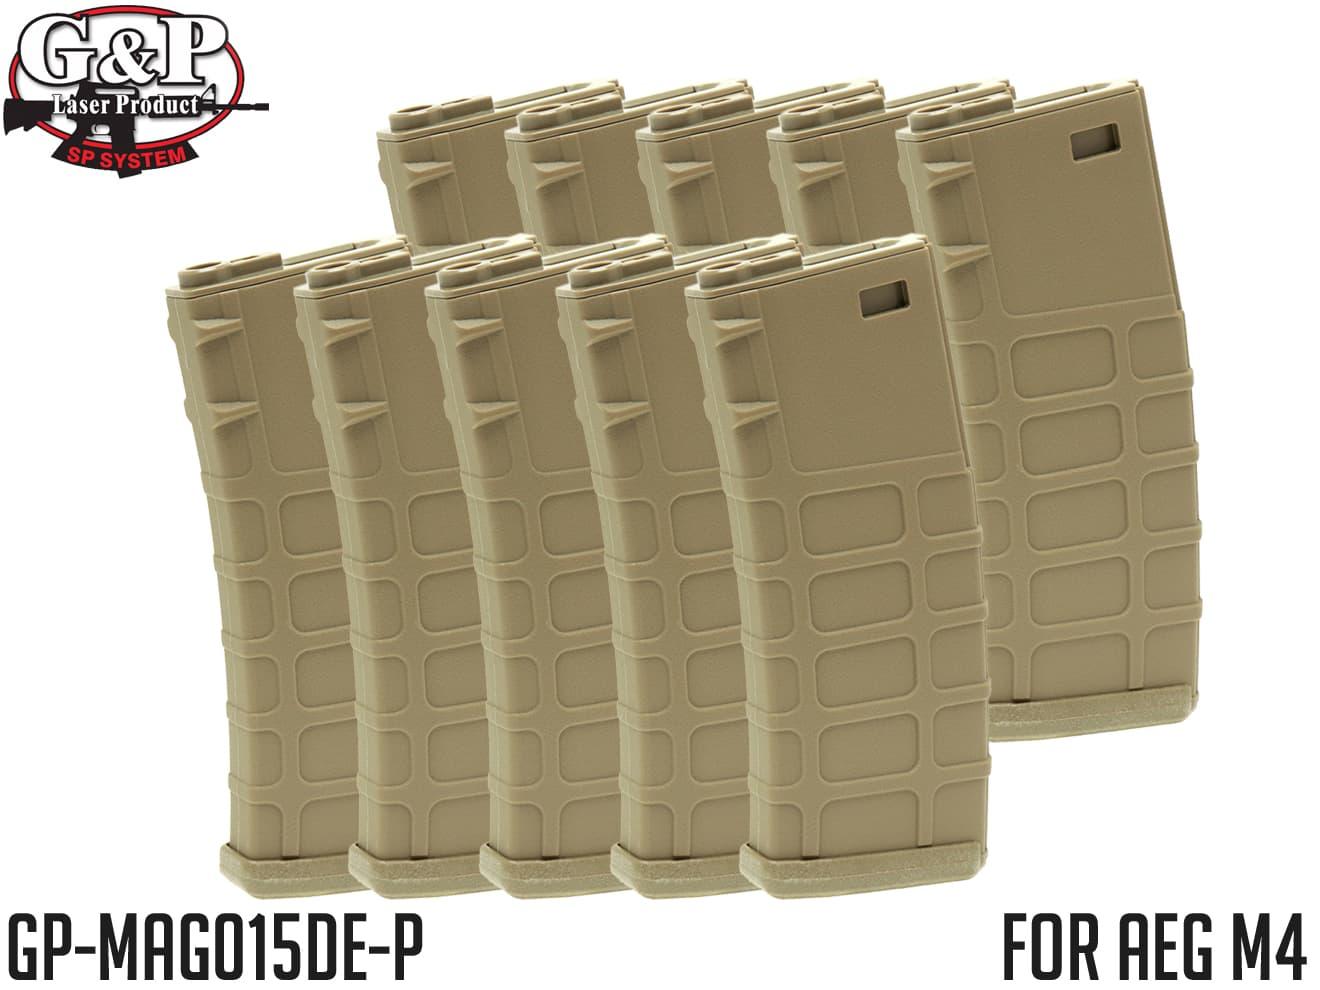 G&P GMAG 340Rds マガジン AEG M4 FDE 10本セット◆MADBULLライセンス ゼンマイ式 電動M4対応 G&G KRYTAC ICS ARES APS S&T VFC WE